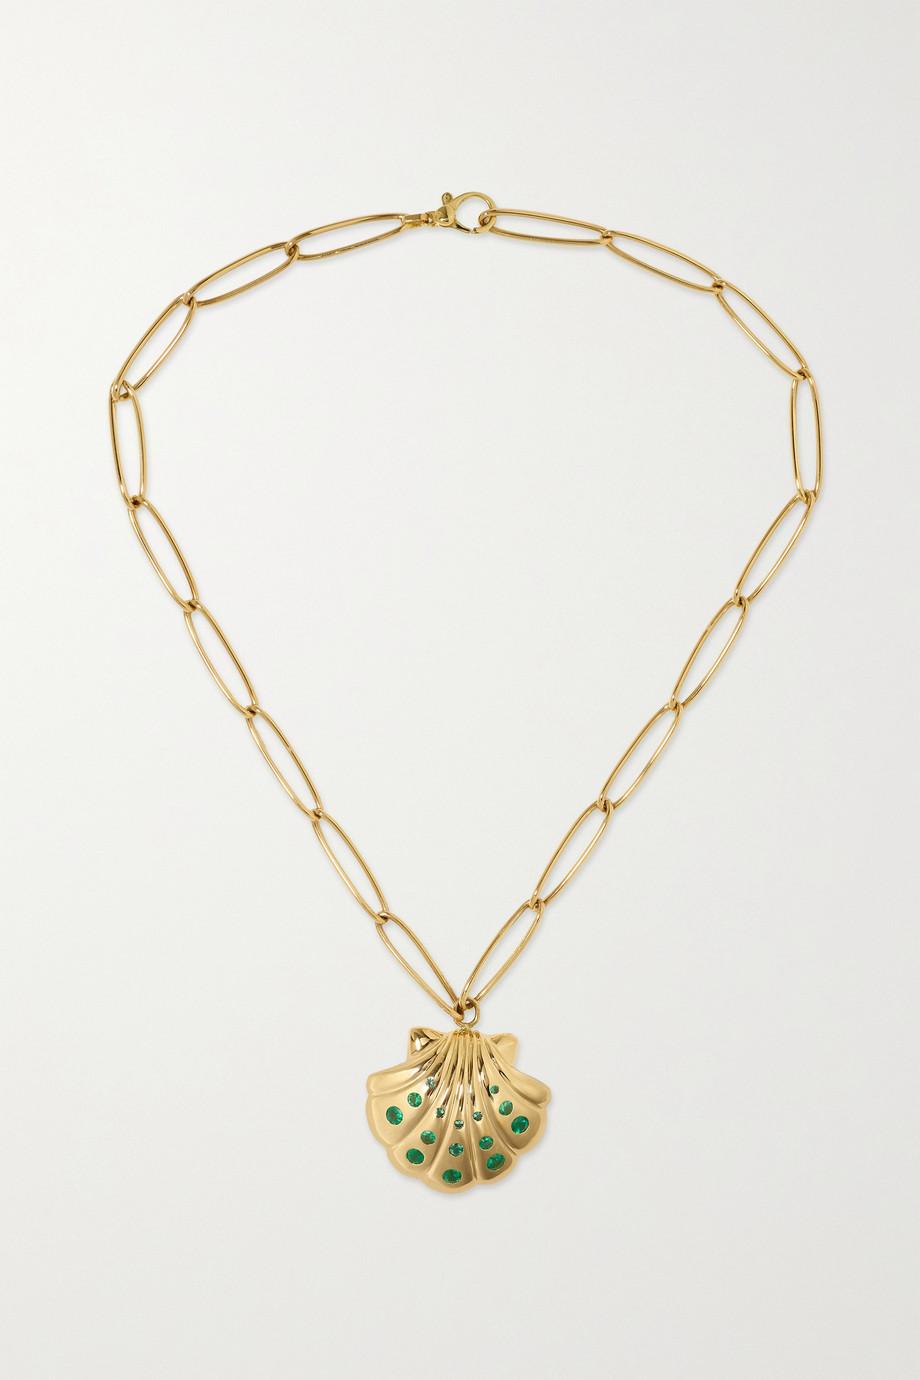 Brent Neale Shell Kette aus 18 Karat Gold mit Smaragden